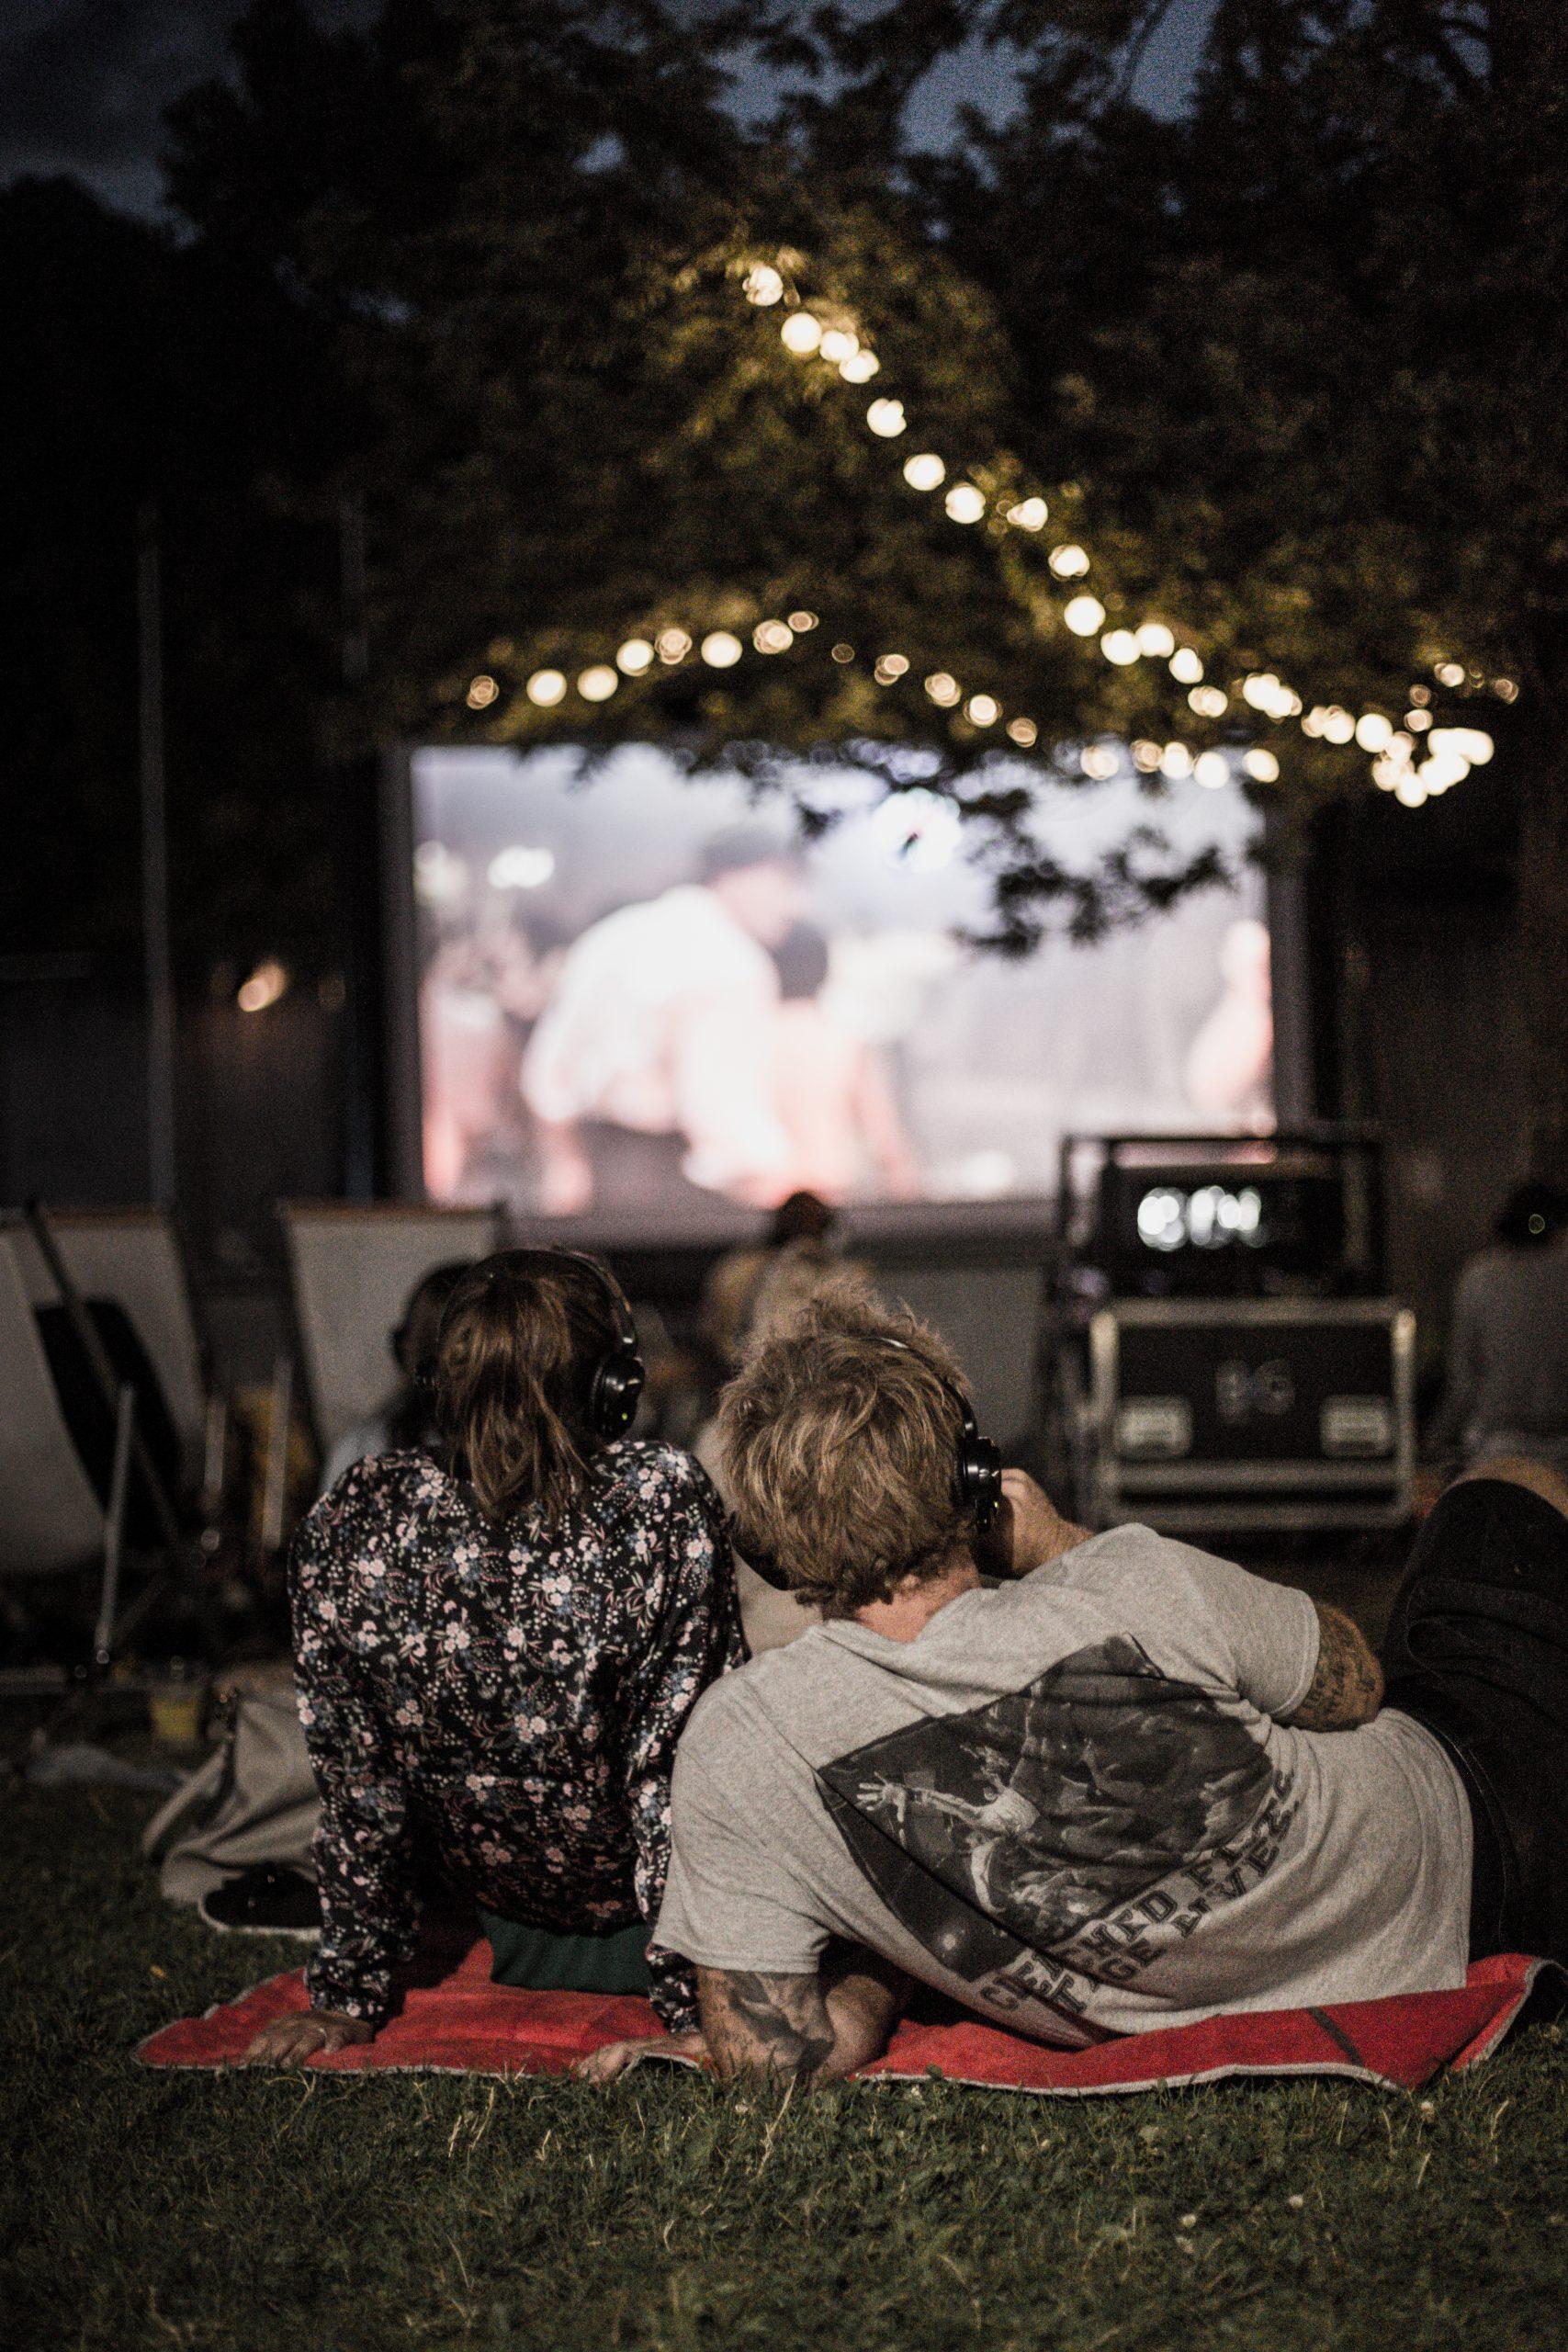 SILENT CINEMA – Open Air Kino | Samstag, 21. August 2021, ab 18:45 | Stadtpark Vöcklabruck